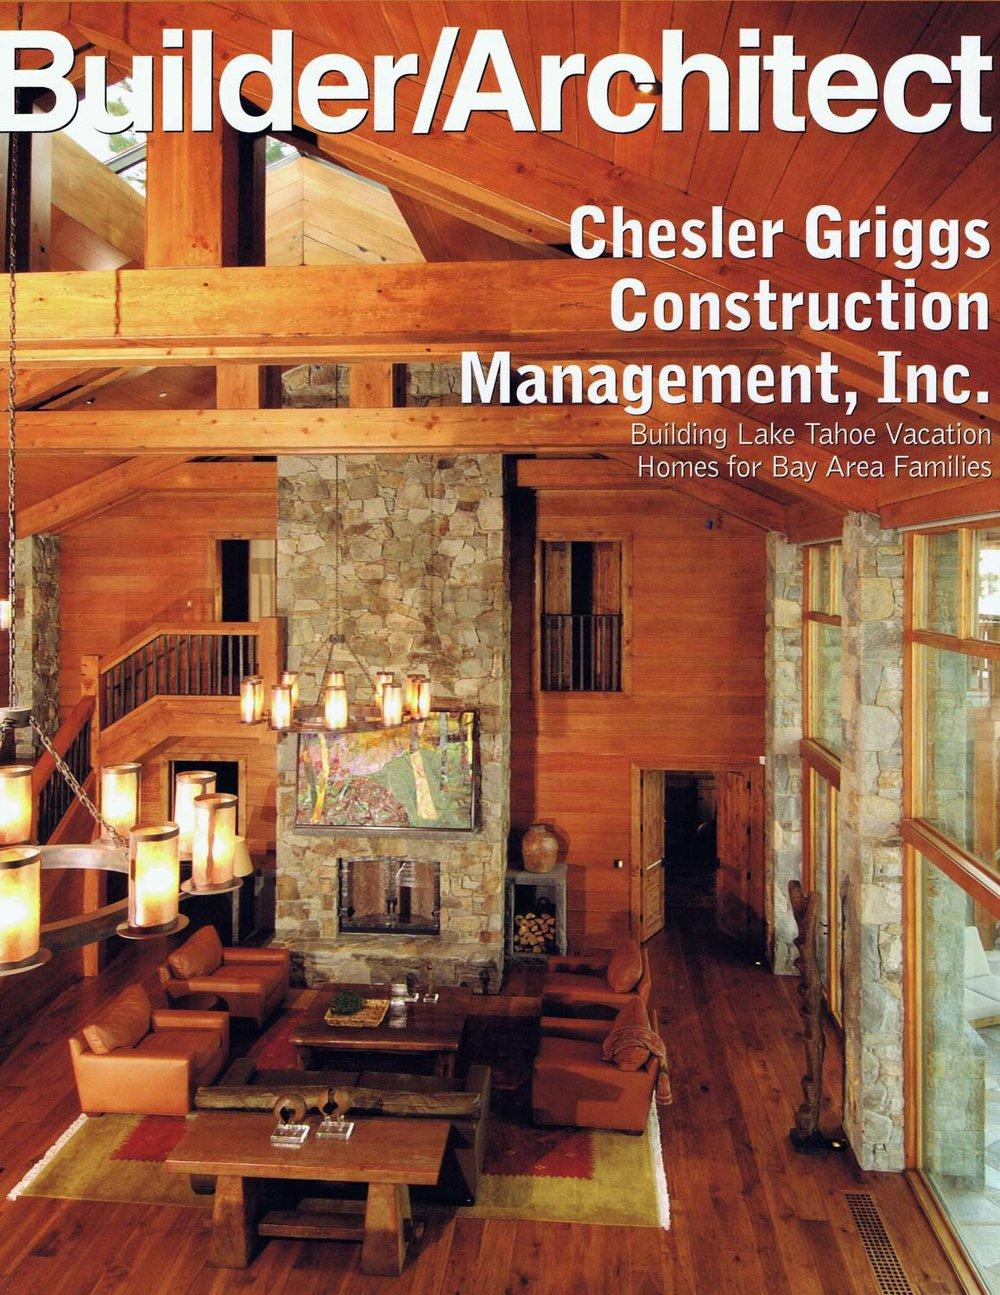 Builder Architect Magazine cover resized no date.jpg